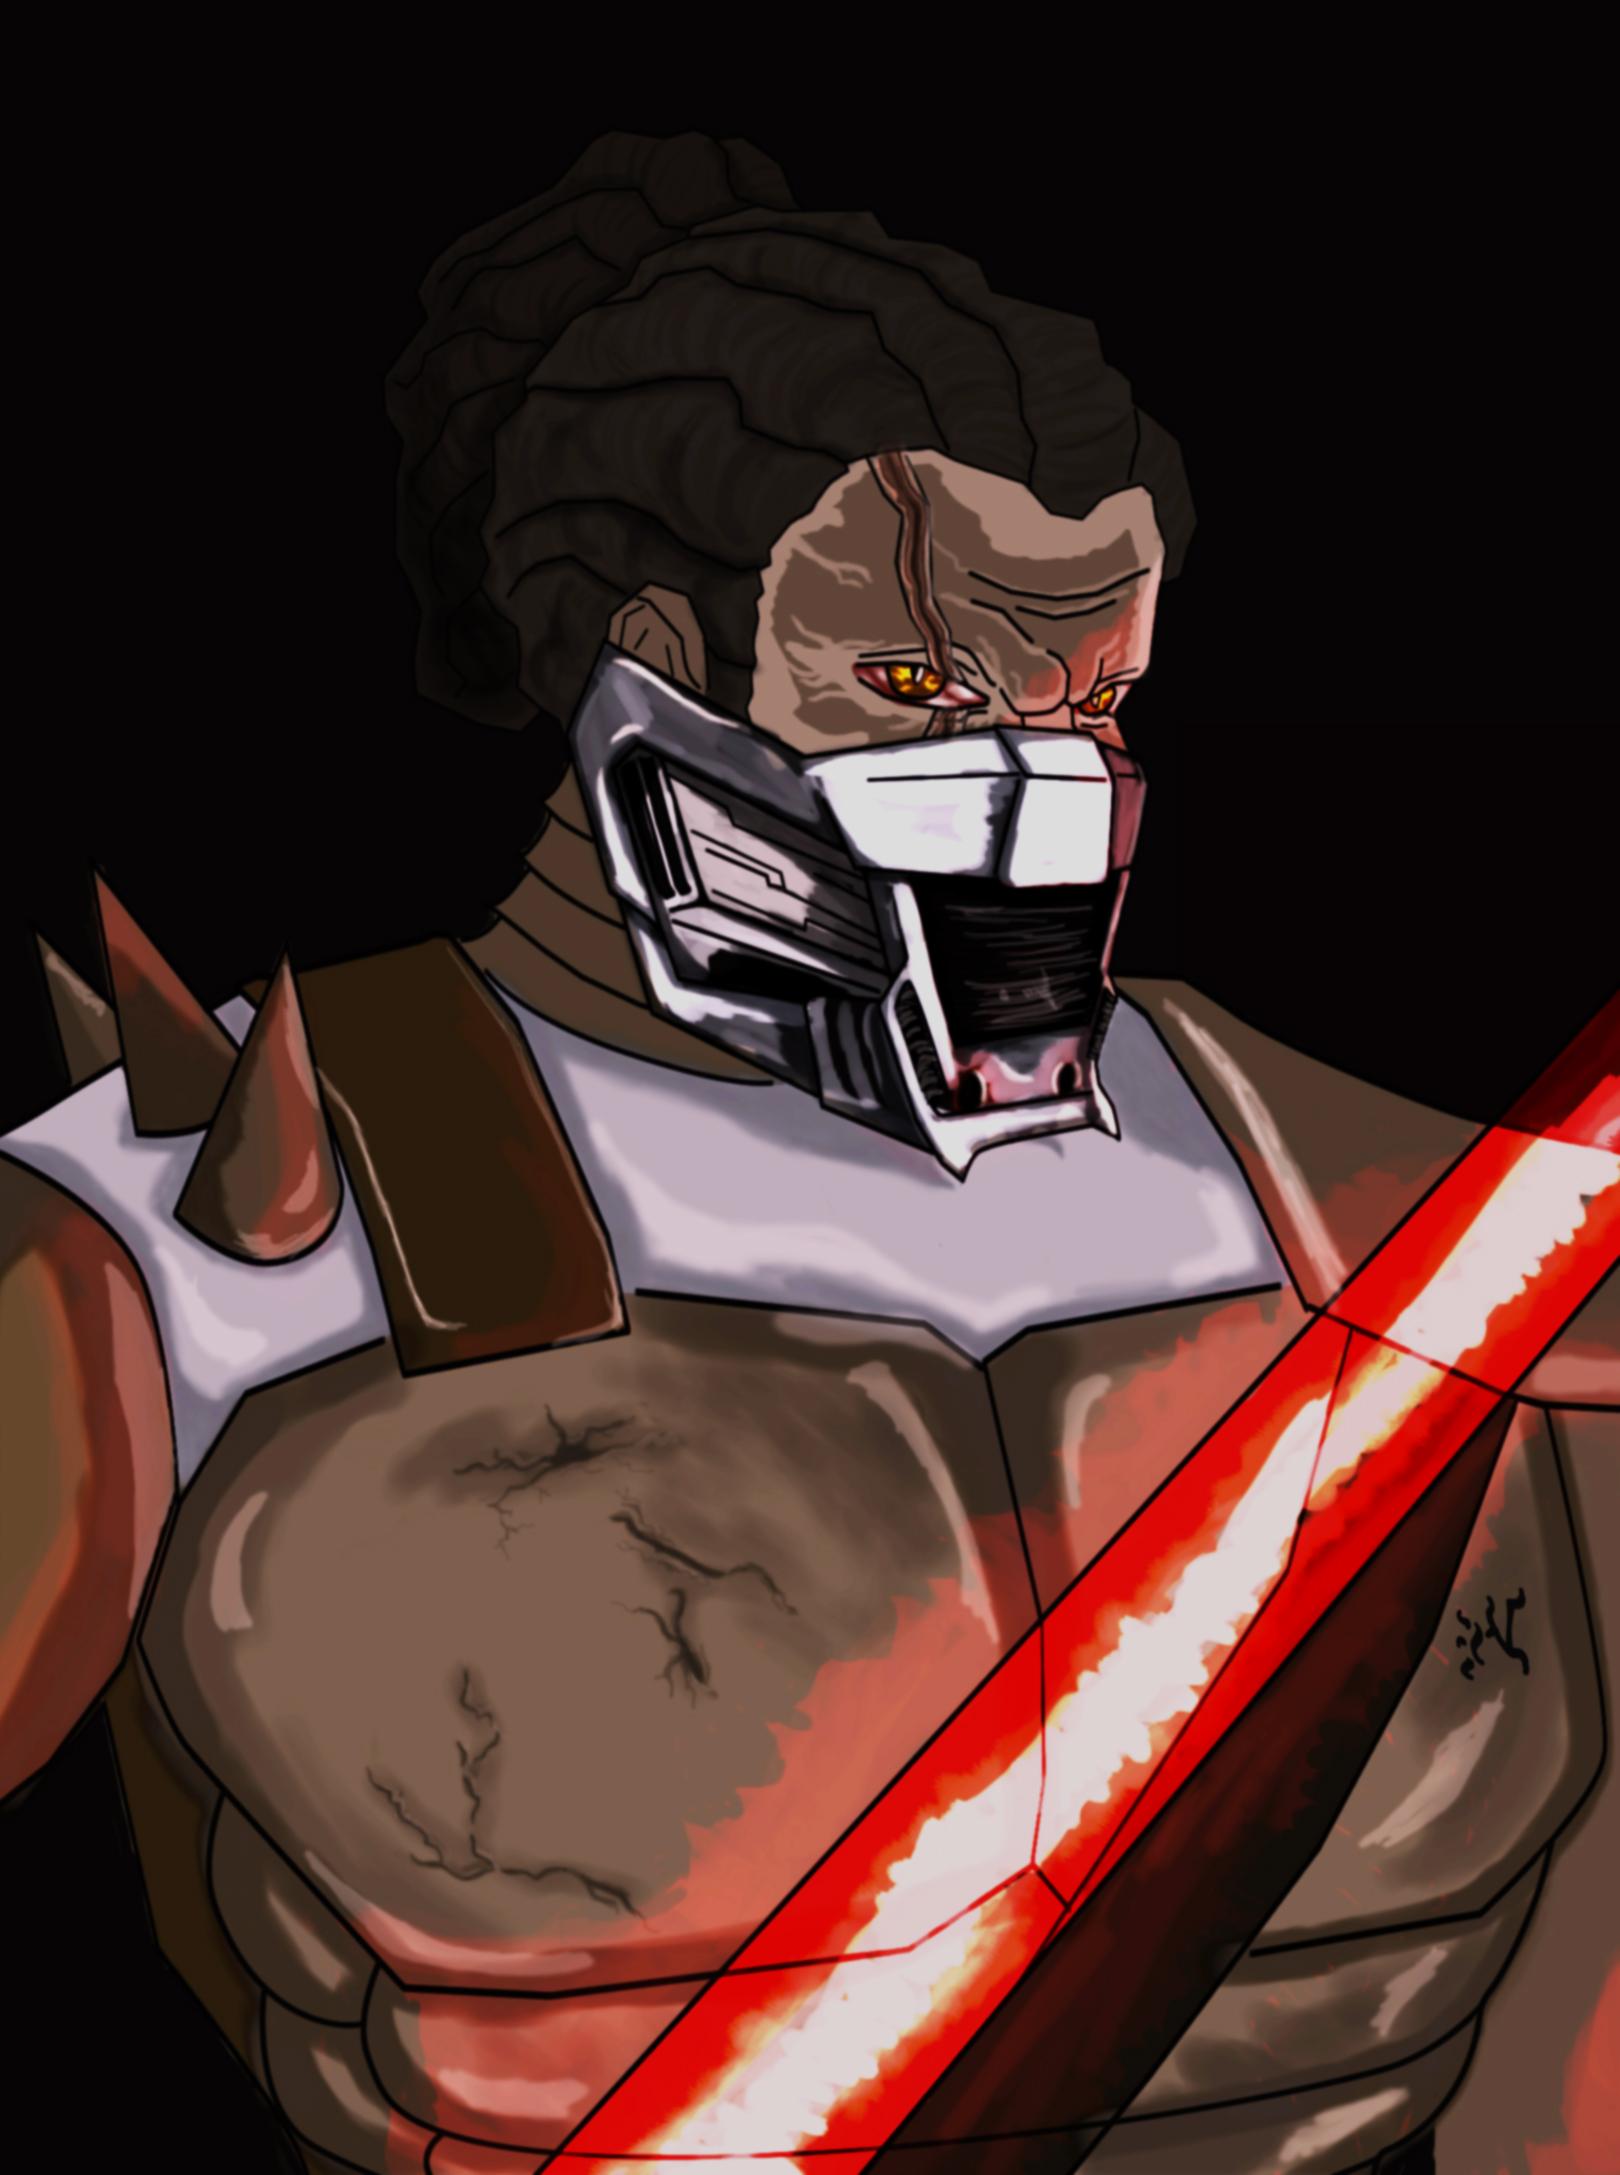 SWTOR-Sith Juggernaut Homage